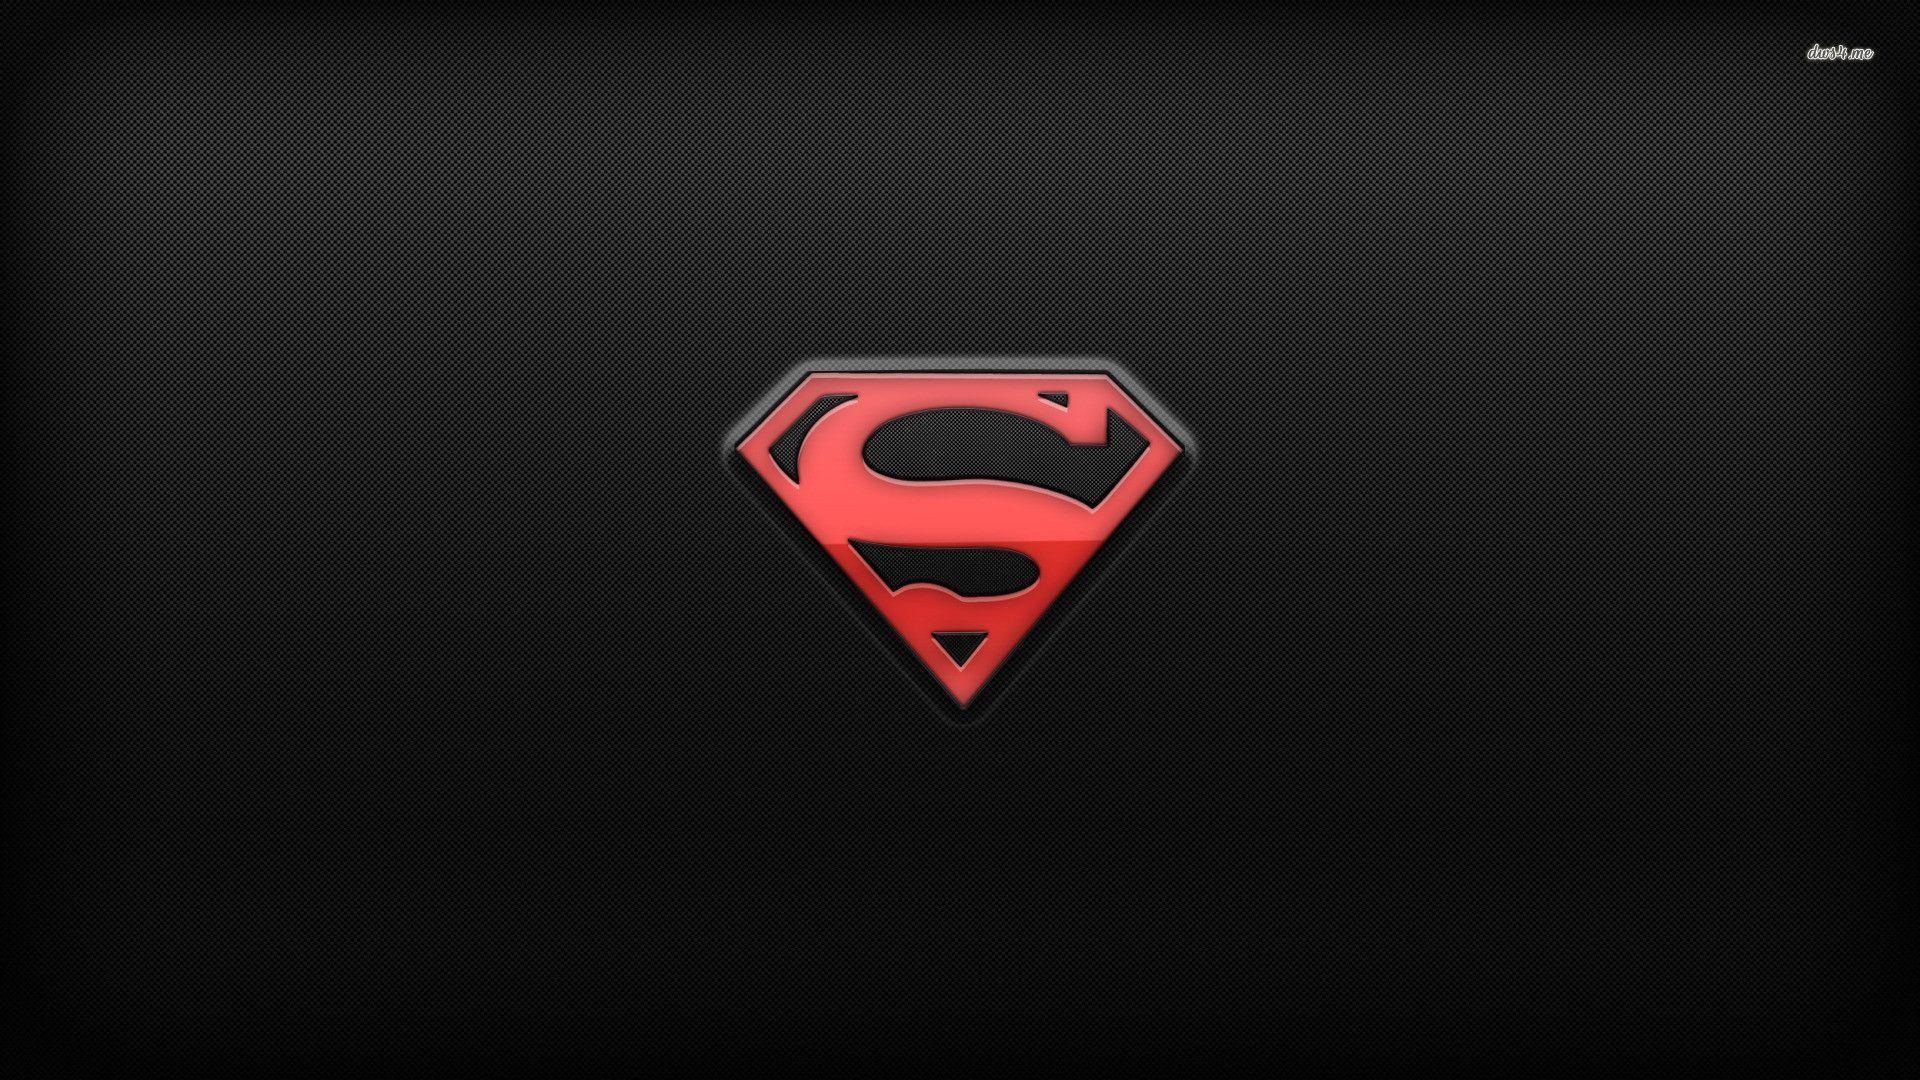 … Superman Logos Wallpapers Wallpaper Cave